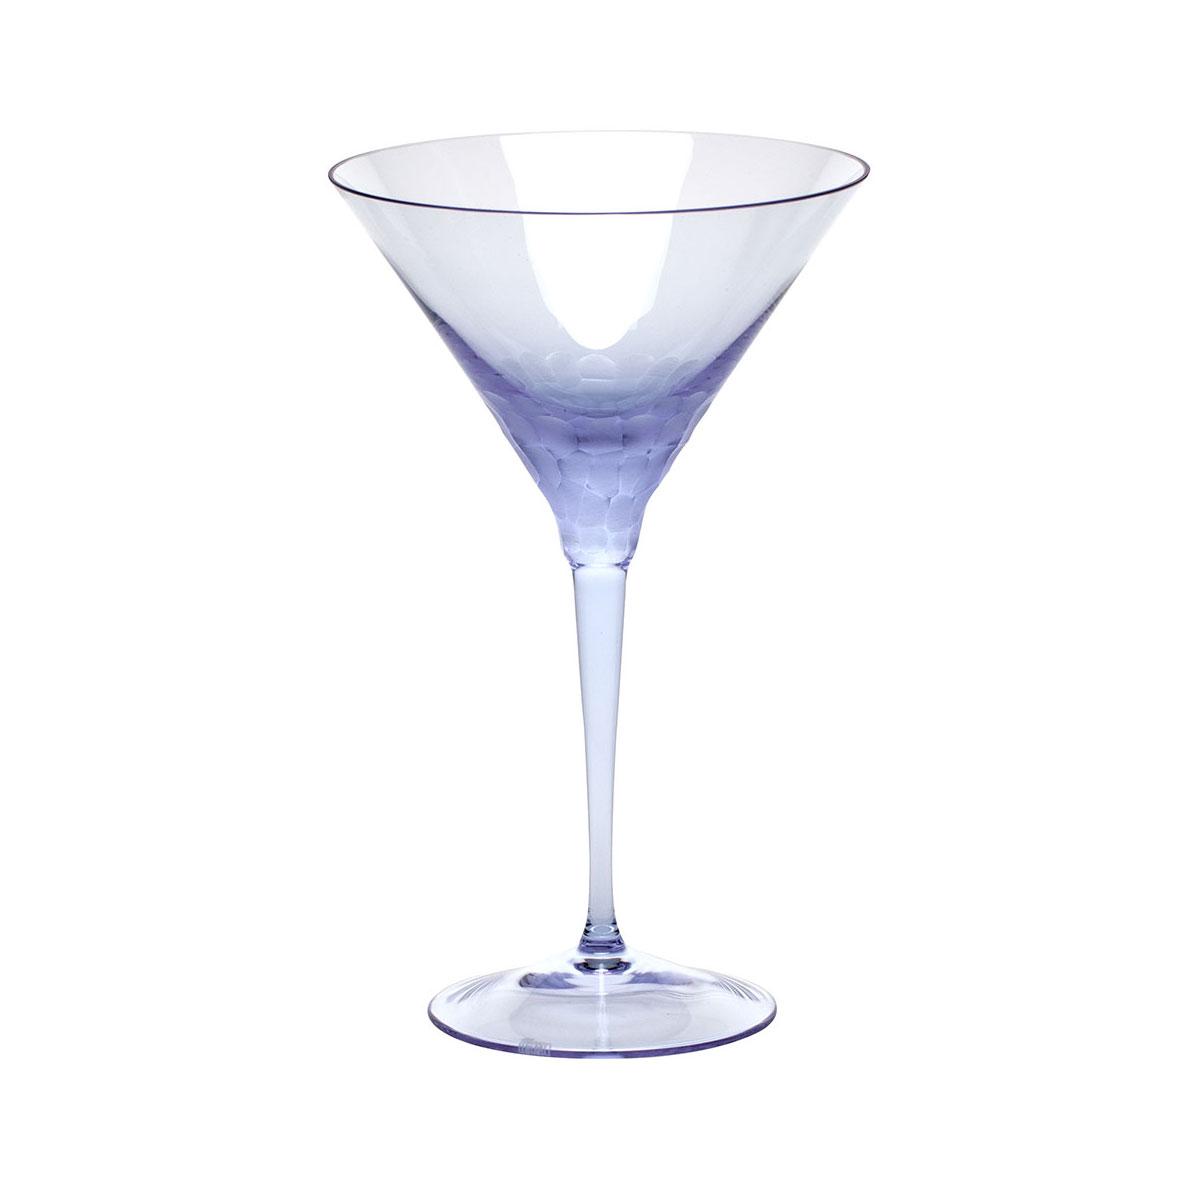 Moser Crystal Pebbles Martini Glass, Alexandrite Purple, Single